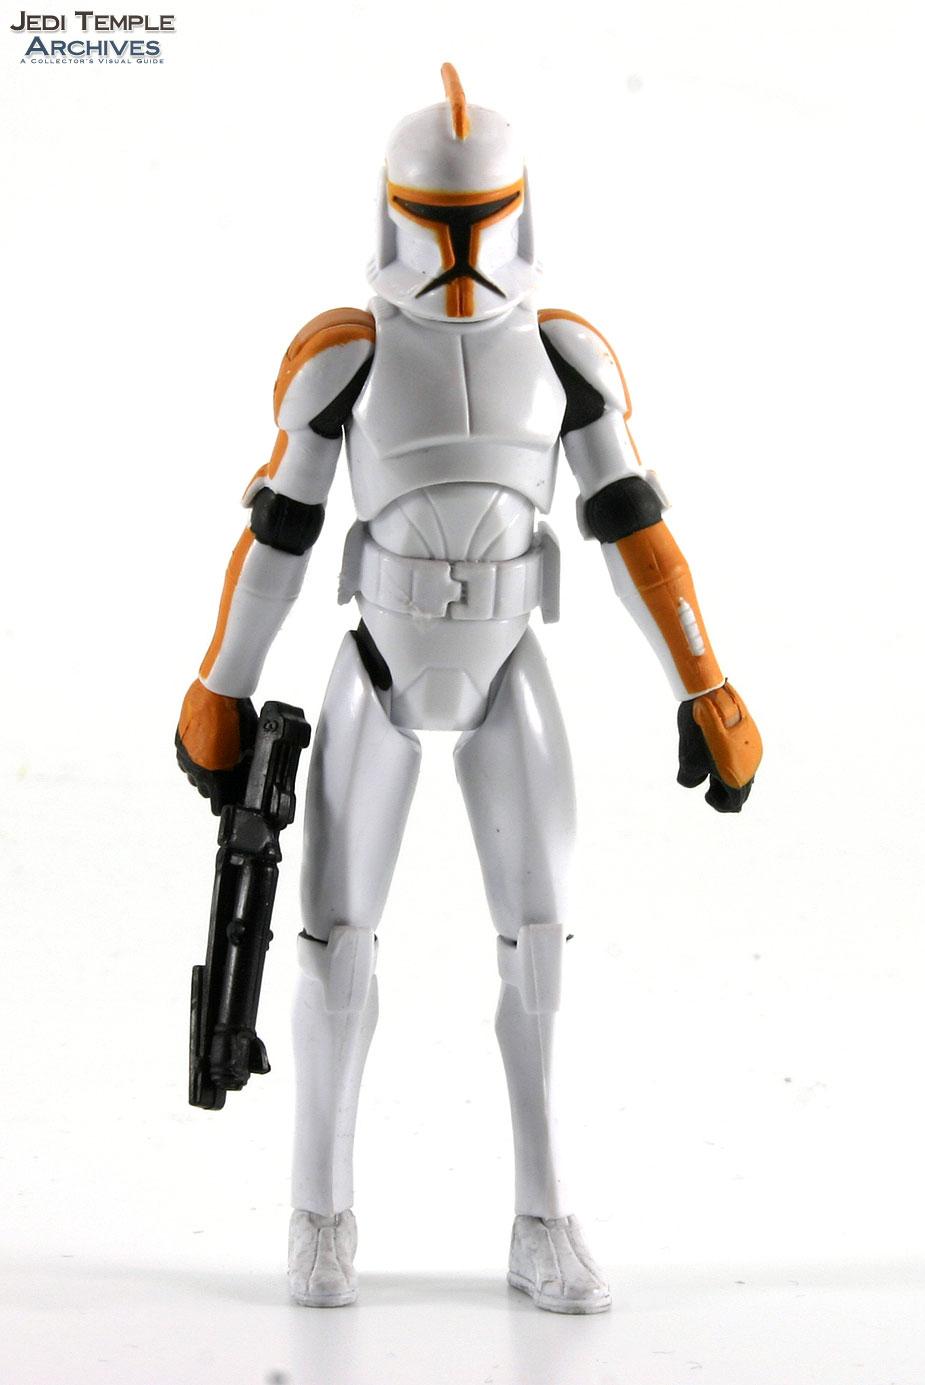 212th Battalion Trooper | Obi-Wan Kenobi and the 212th Battalion